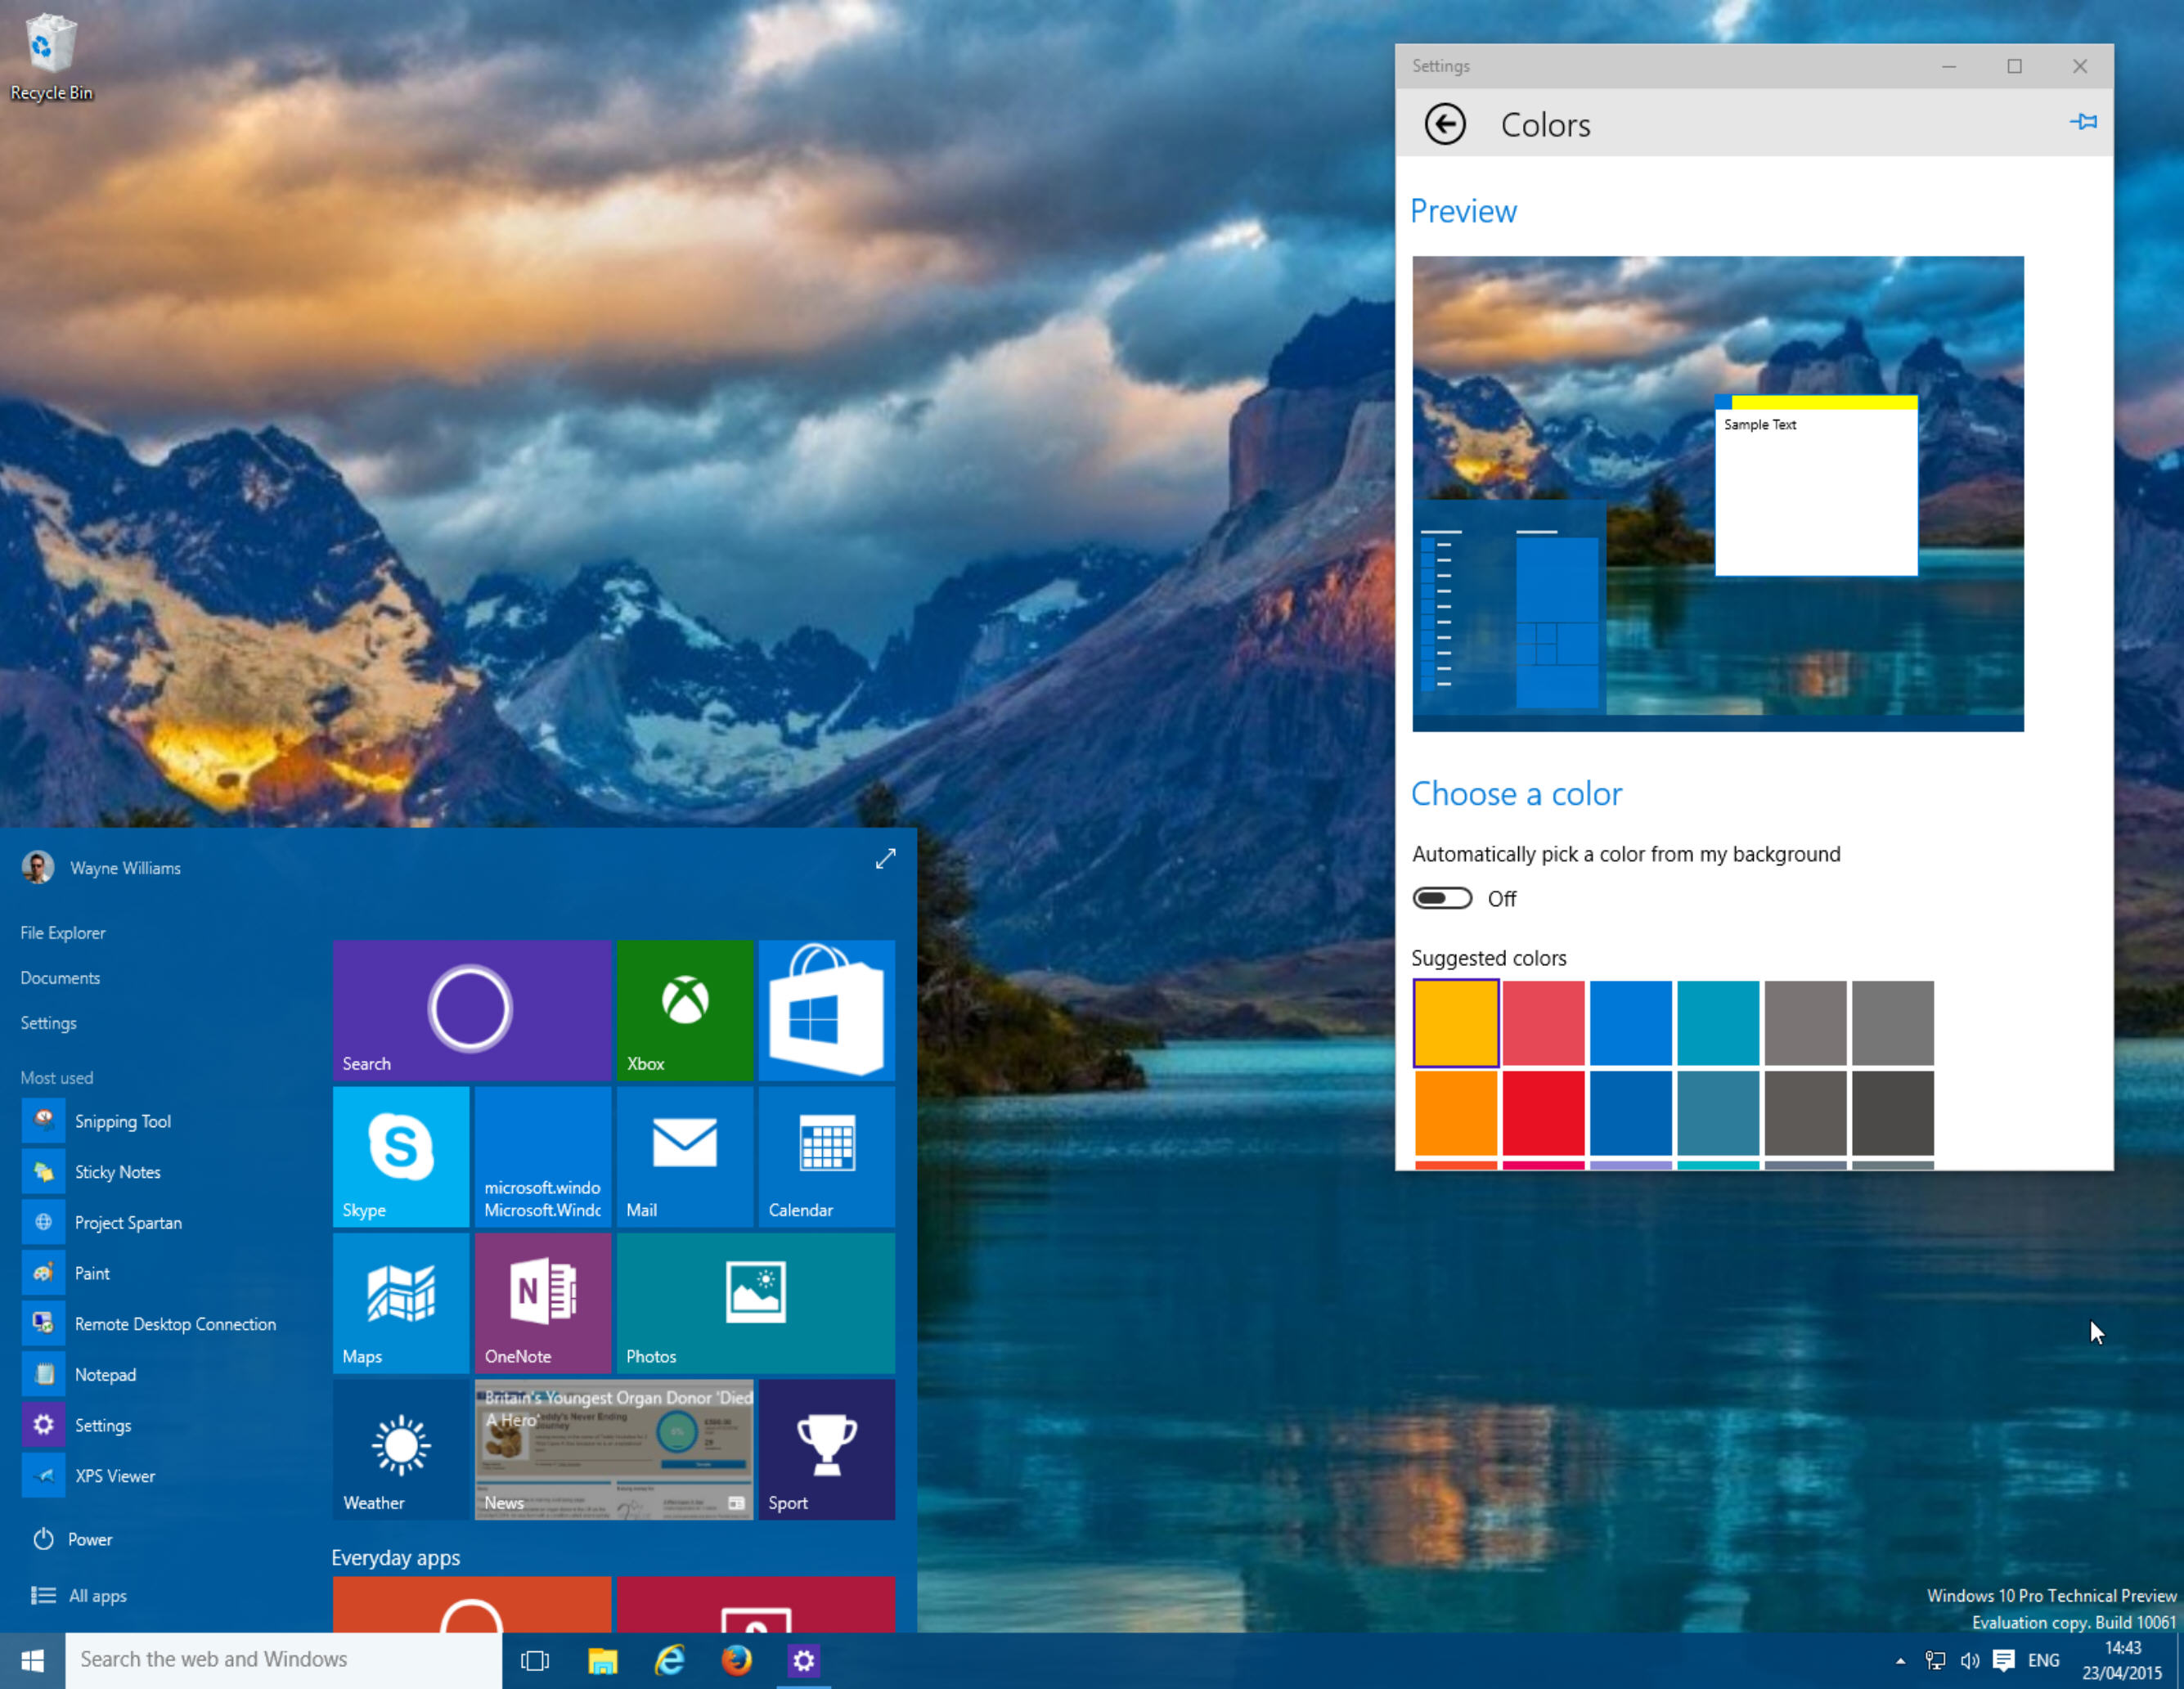 How to customize Windows 10 Build 10061's new Start menu